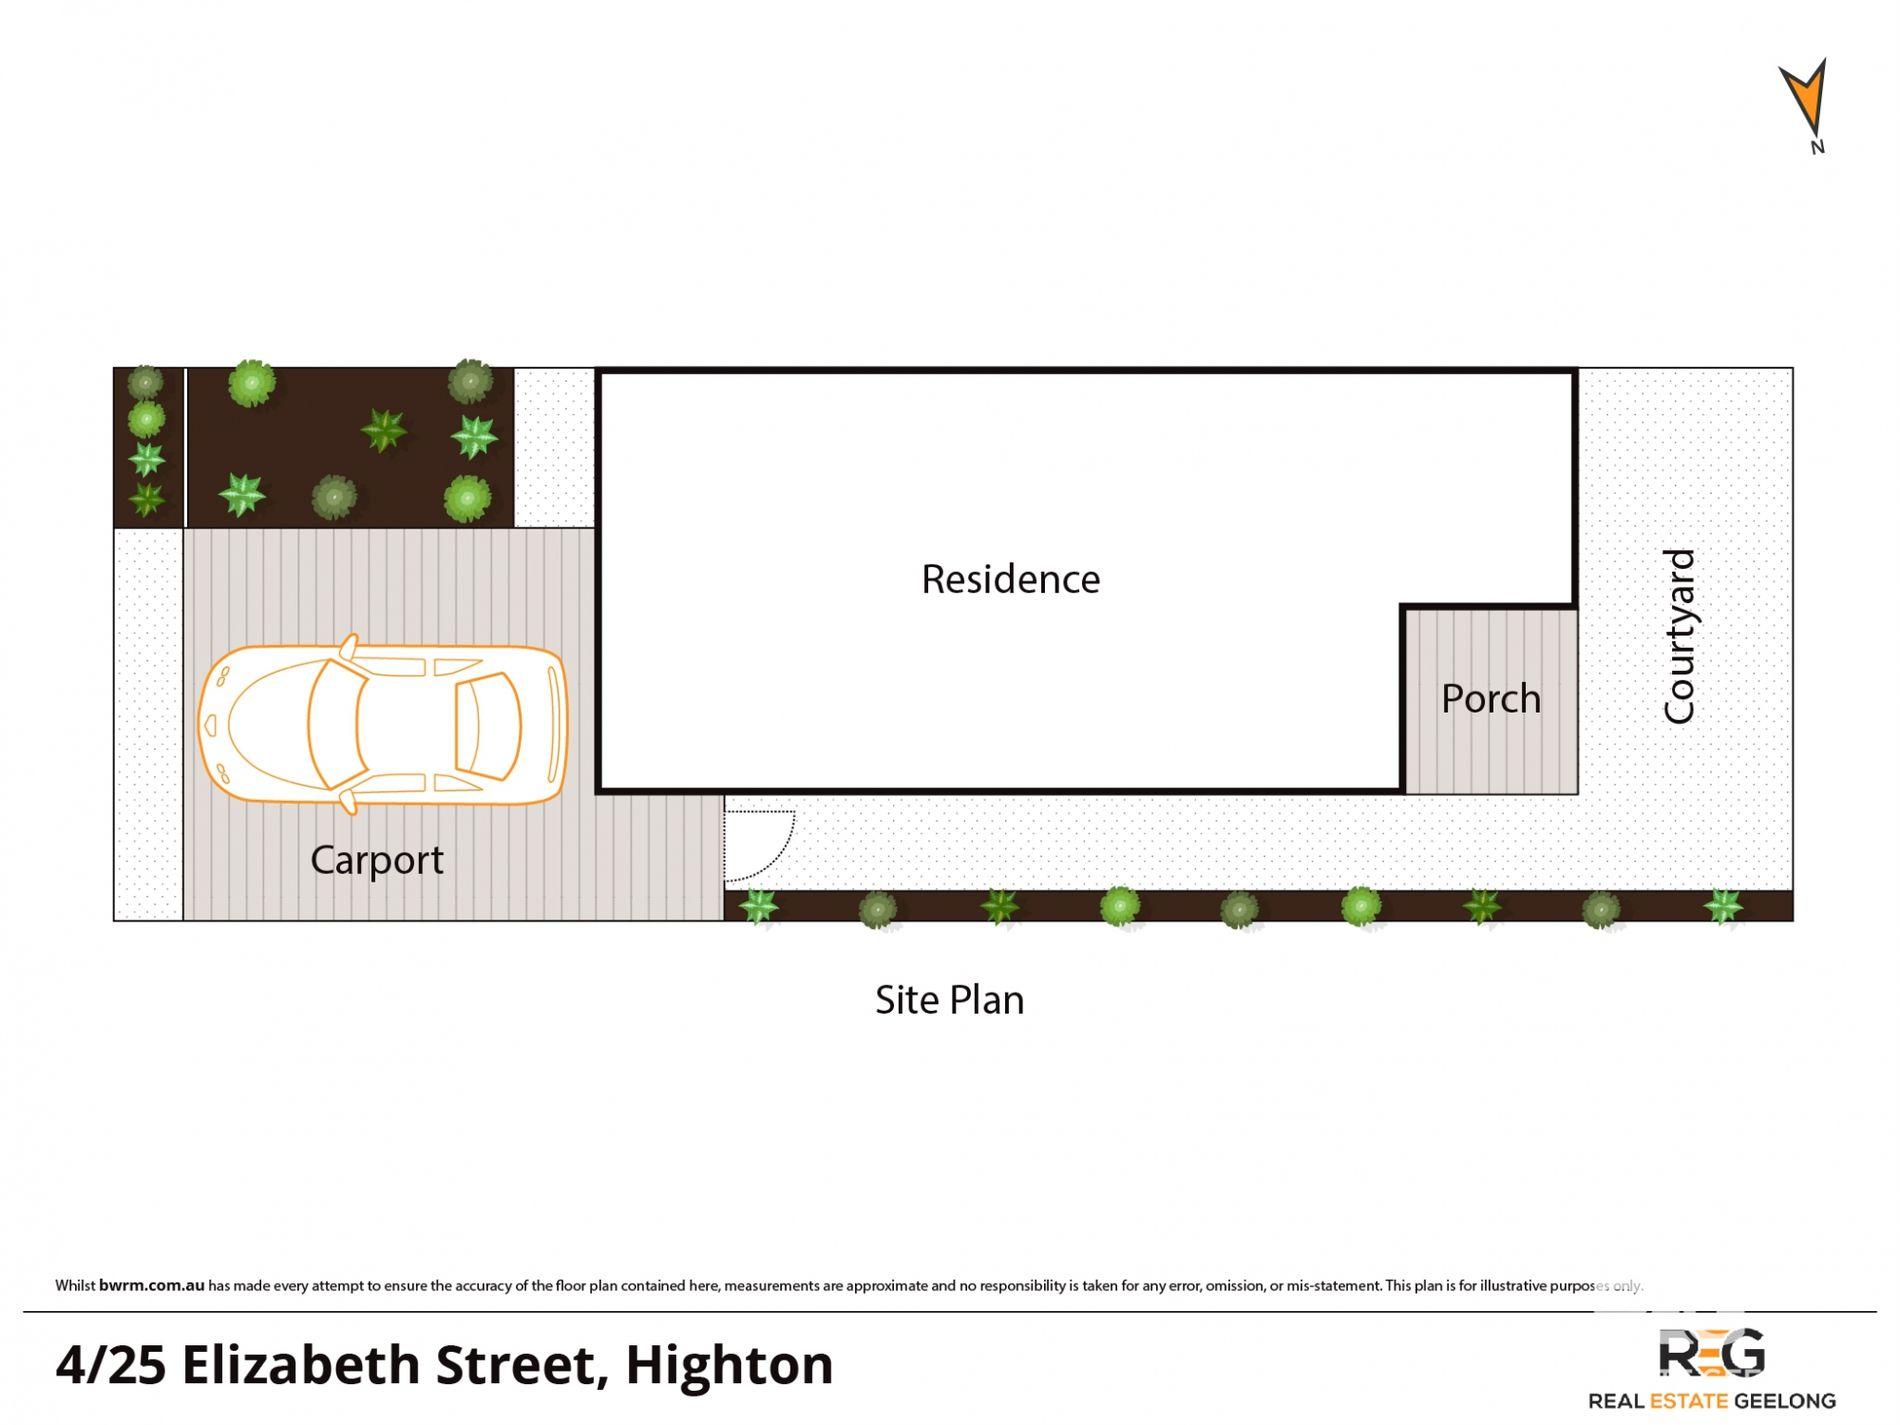 4 / 25 ELIZABETH STREET, Highton